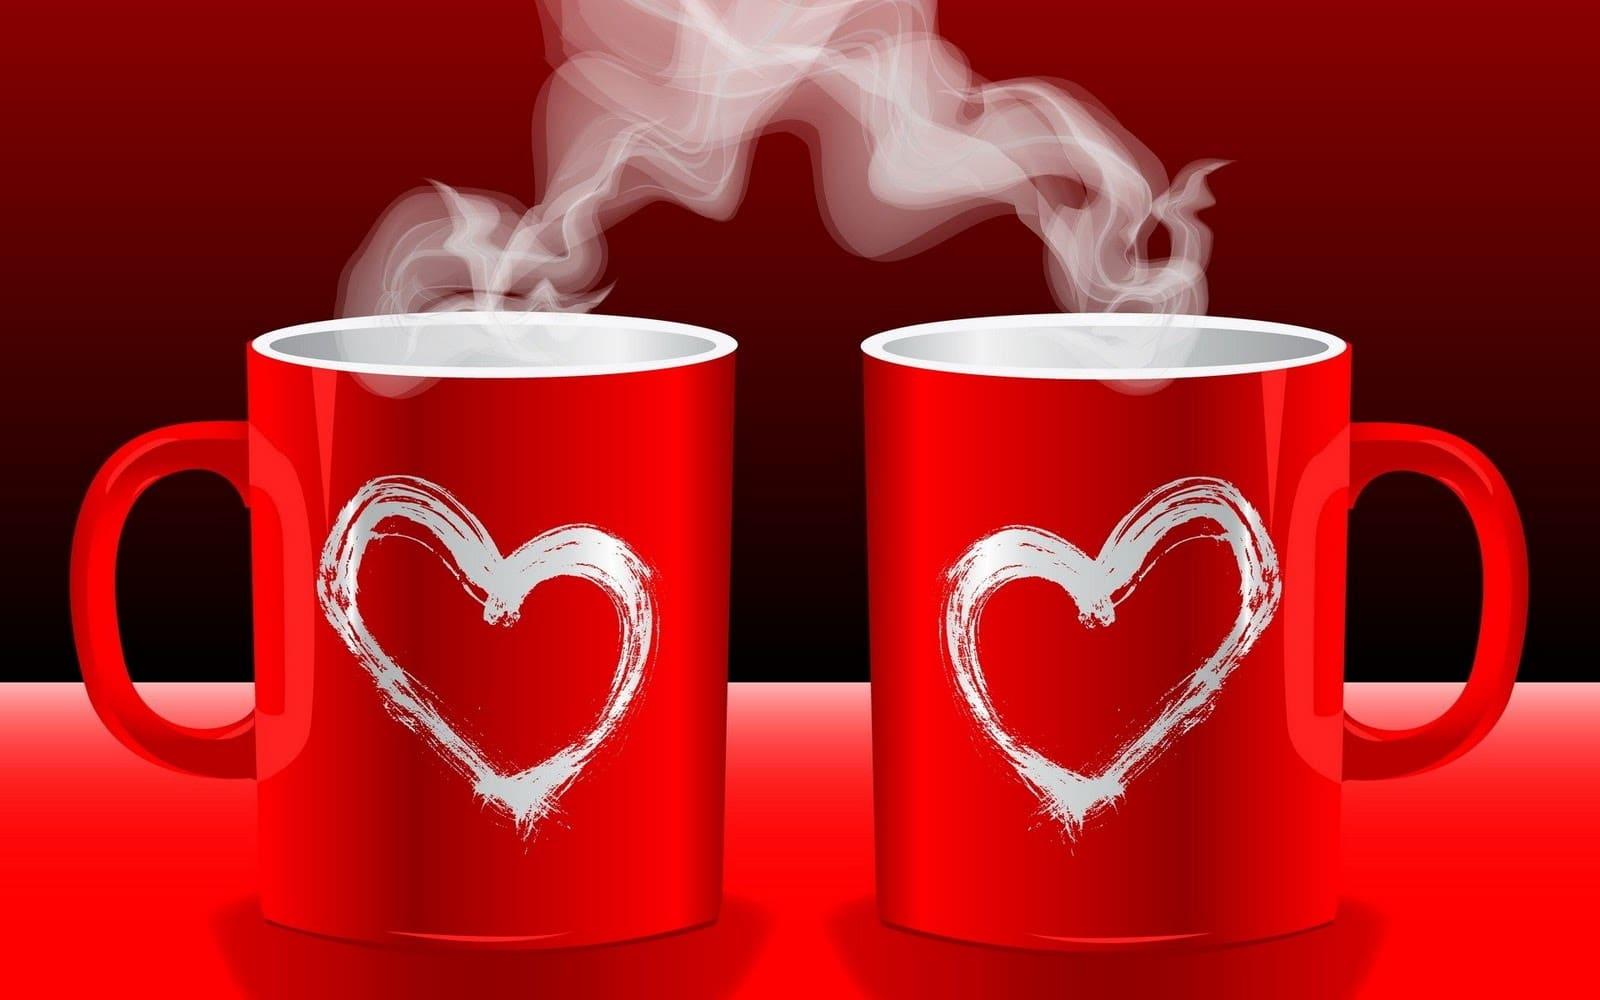 love-hearts-coffee-good-morning-hd-wallpaper-lovewallpapers4u-blogspot-com_